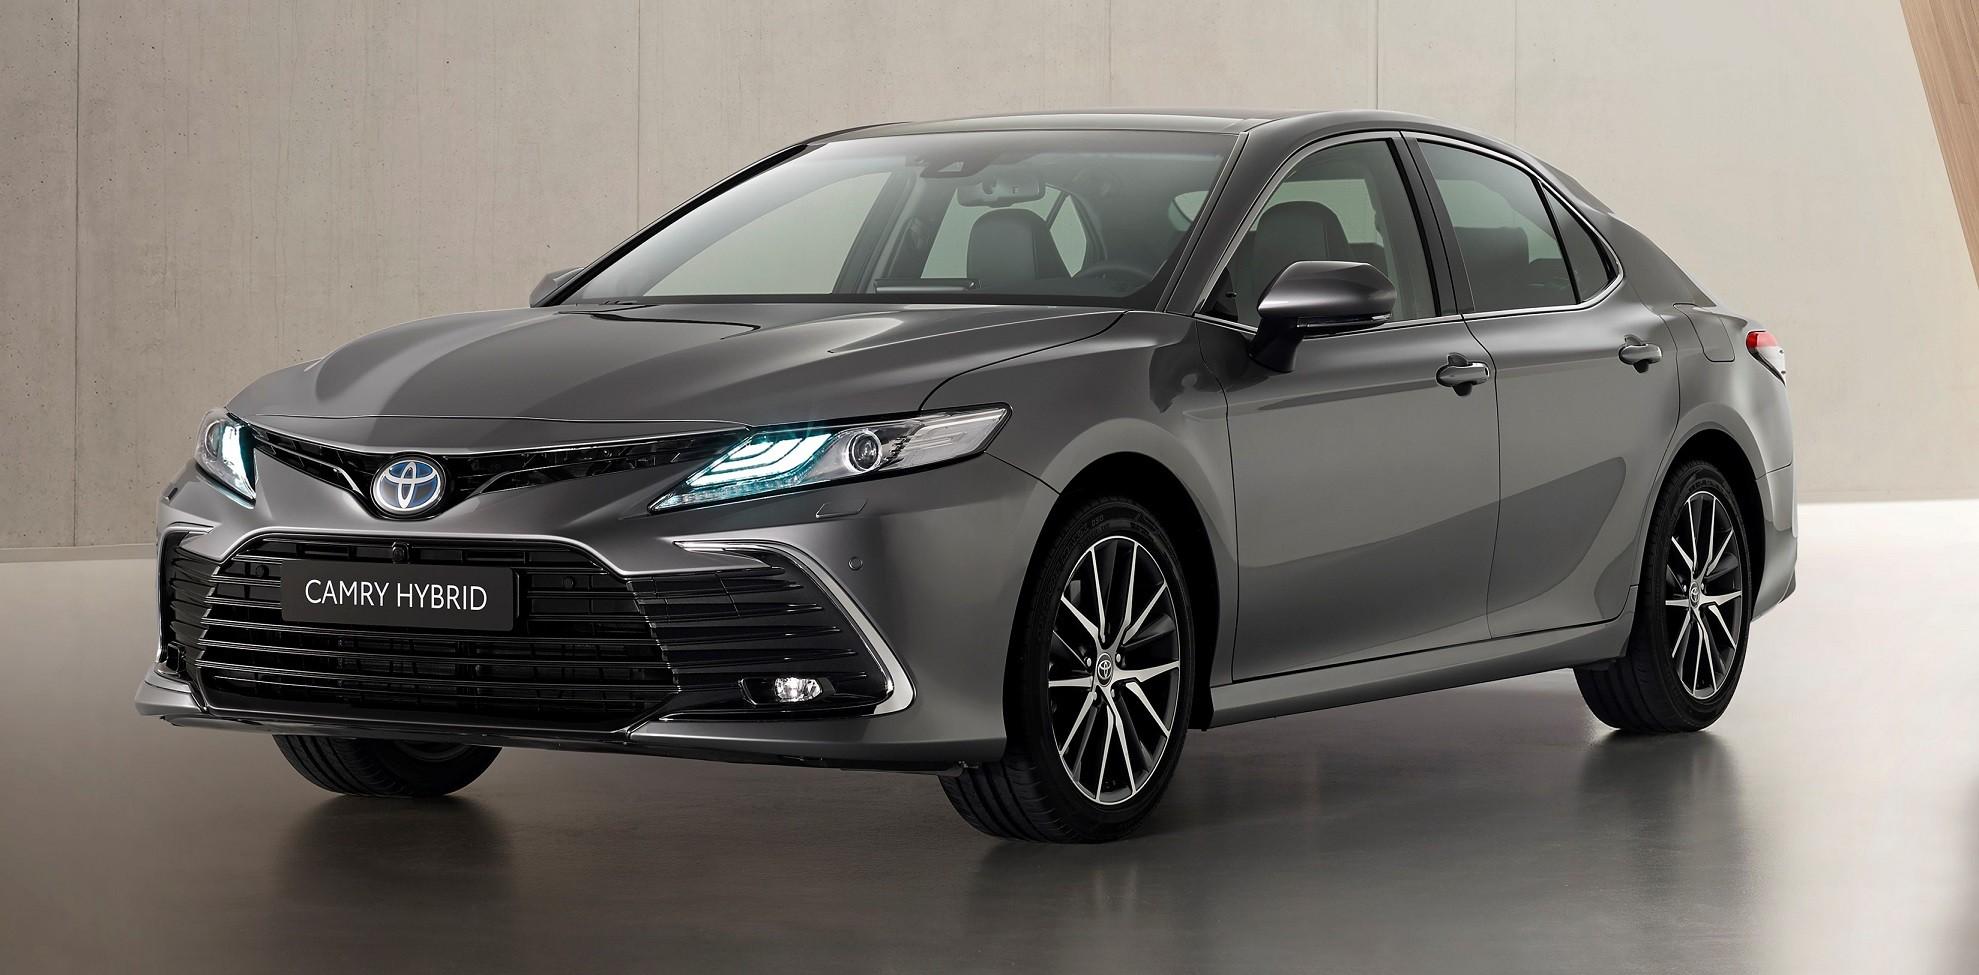 Toyota 2021 Camry Hybrid unveiled